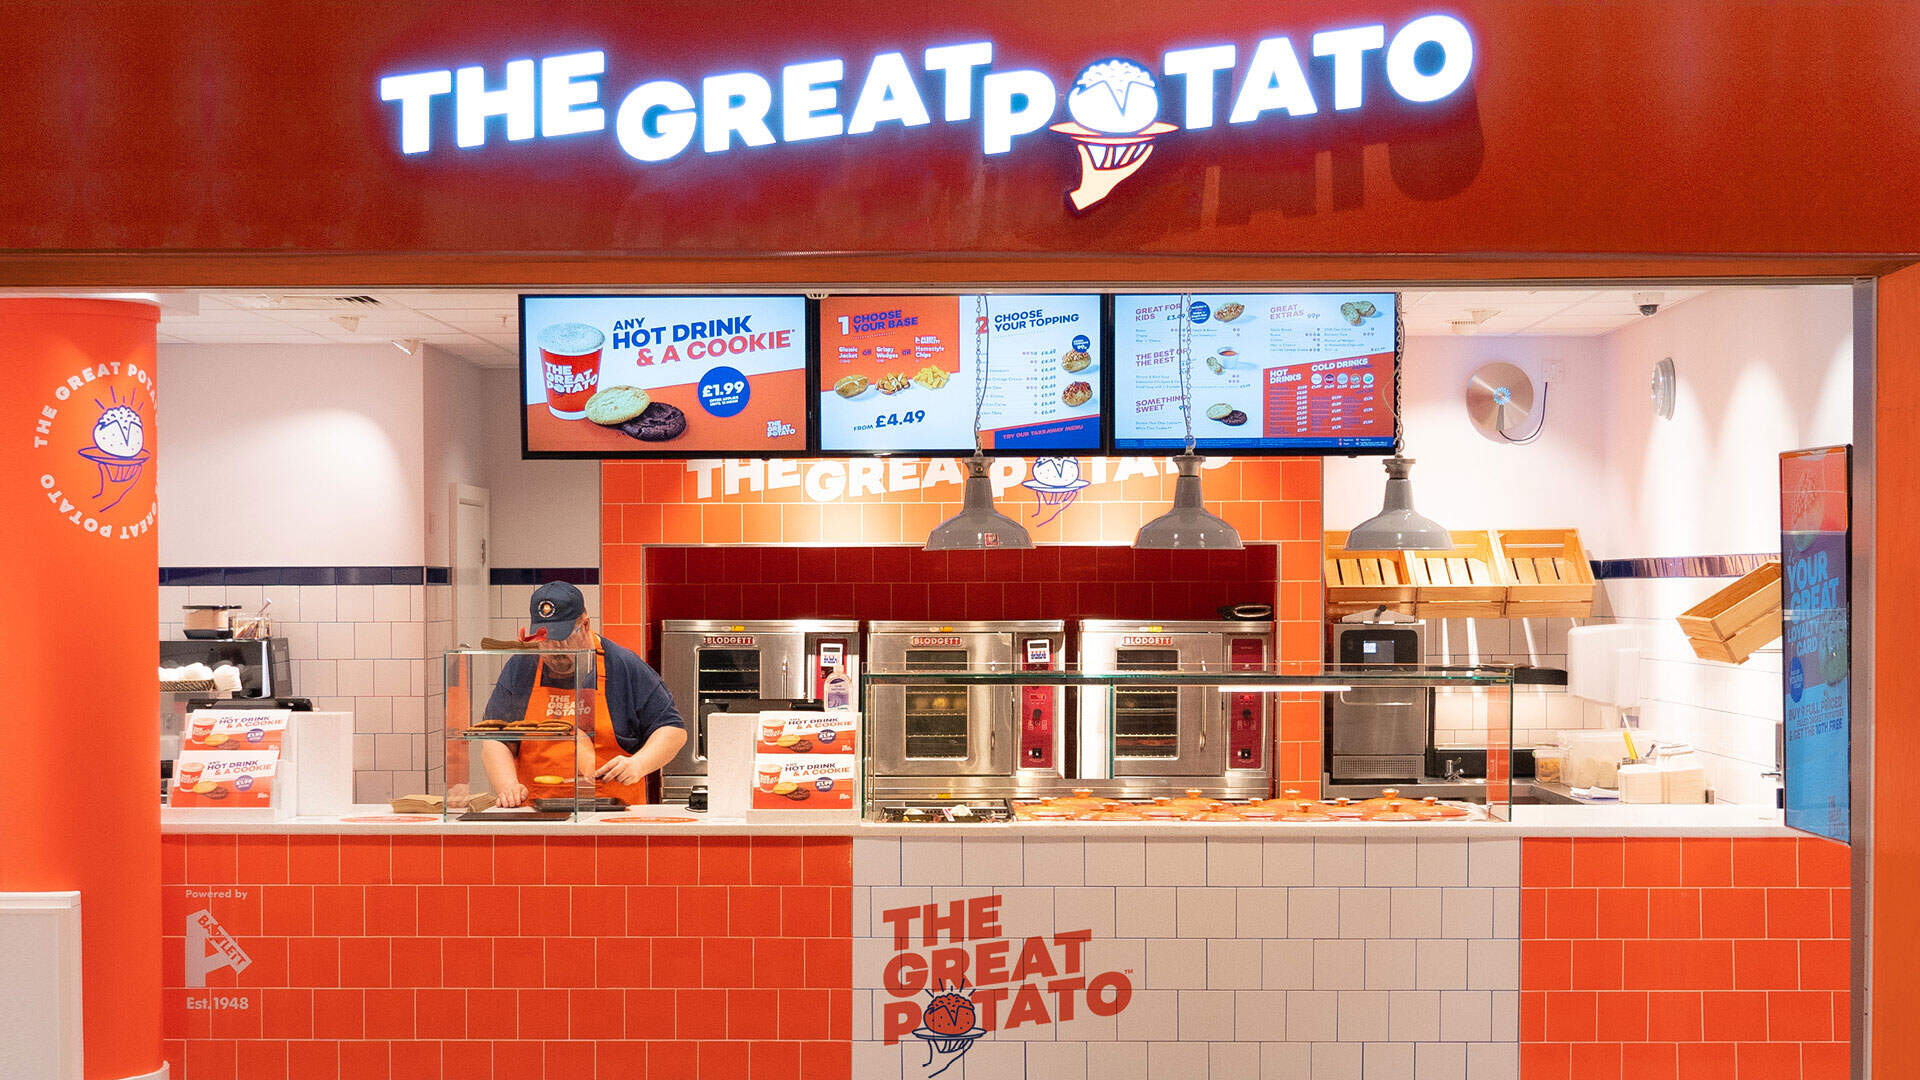 The great potato - rebrand on kiosk